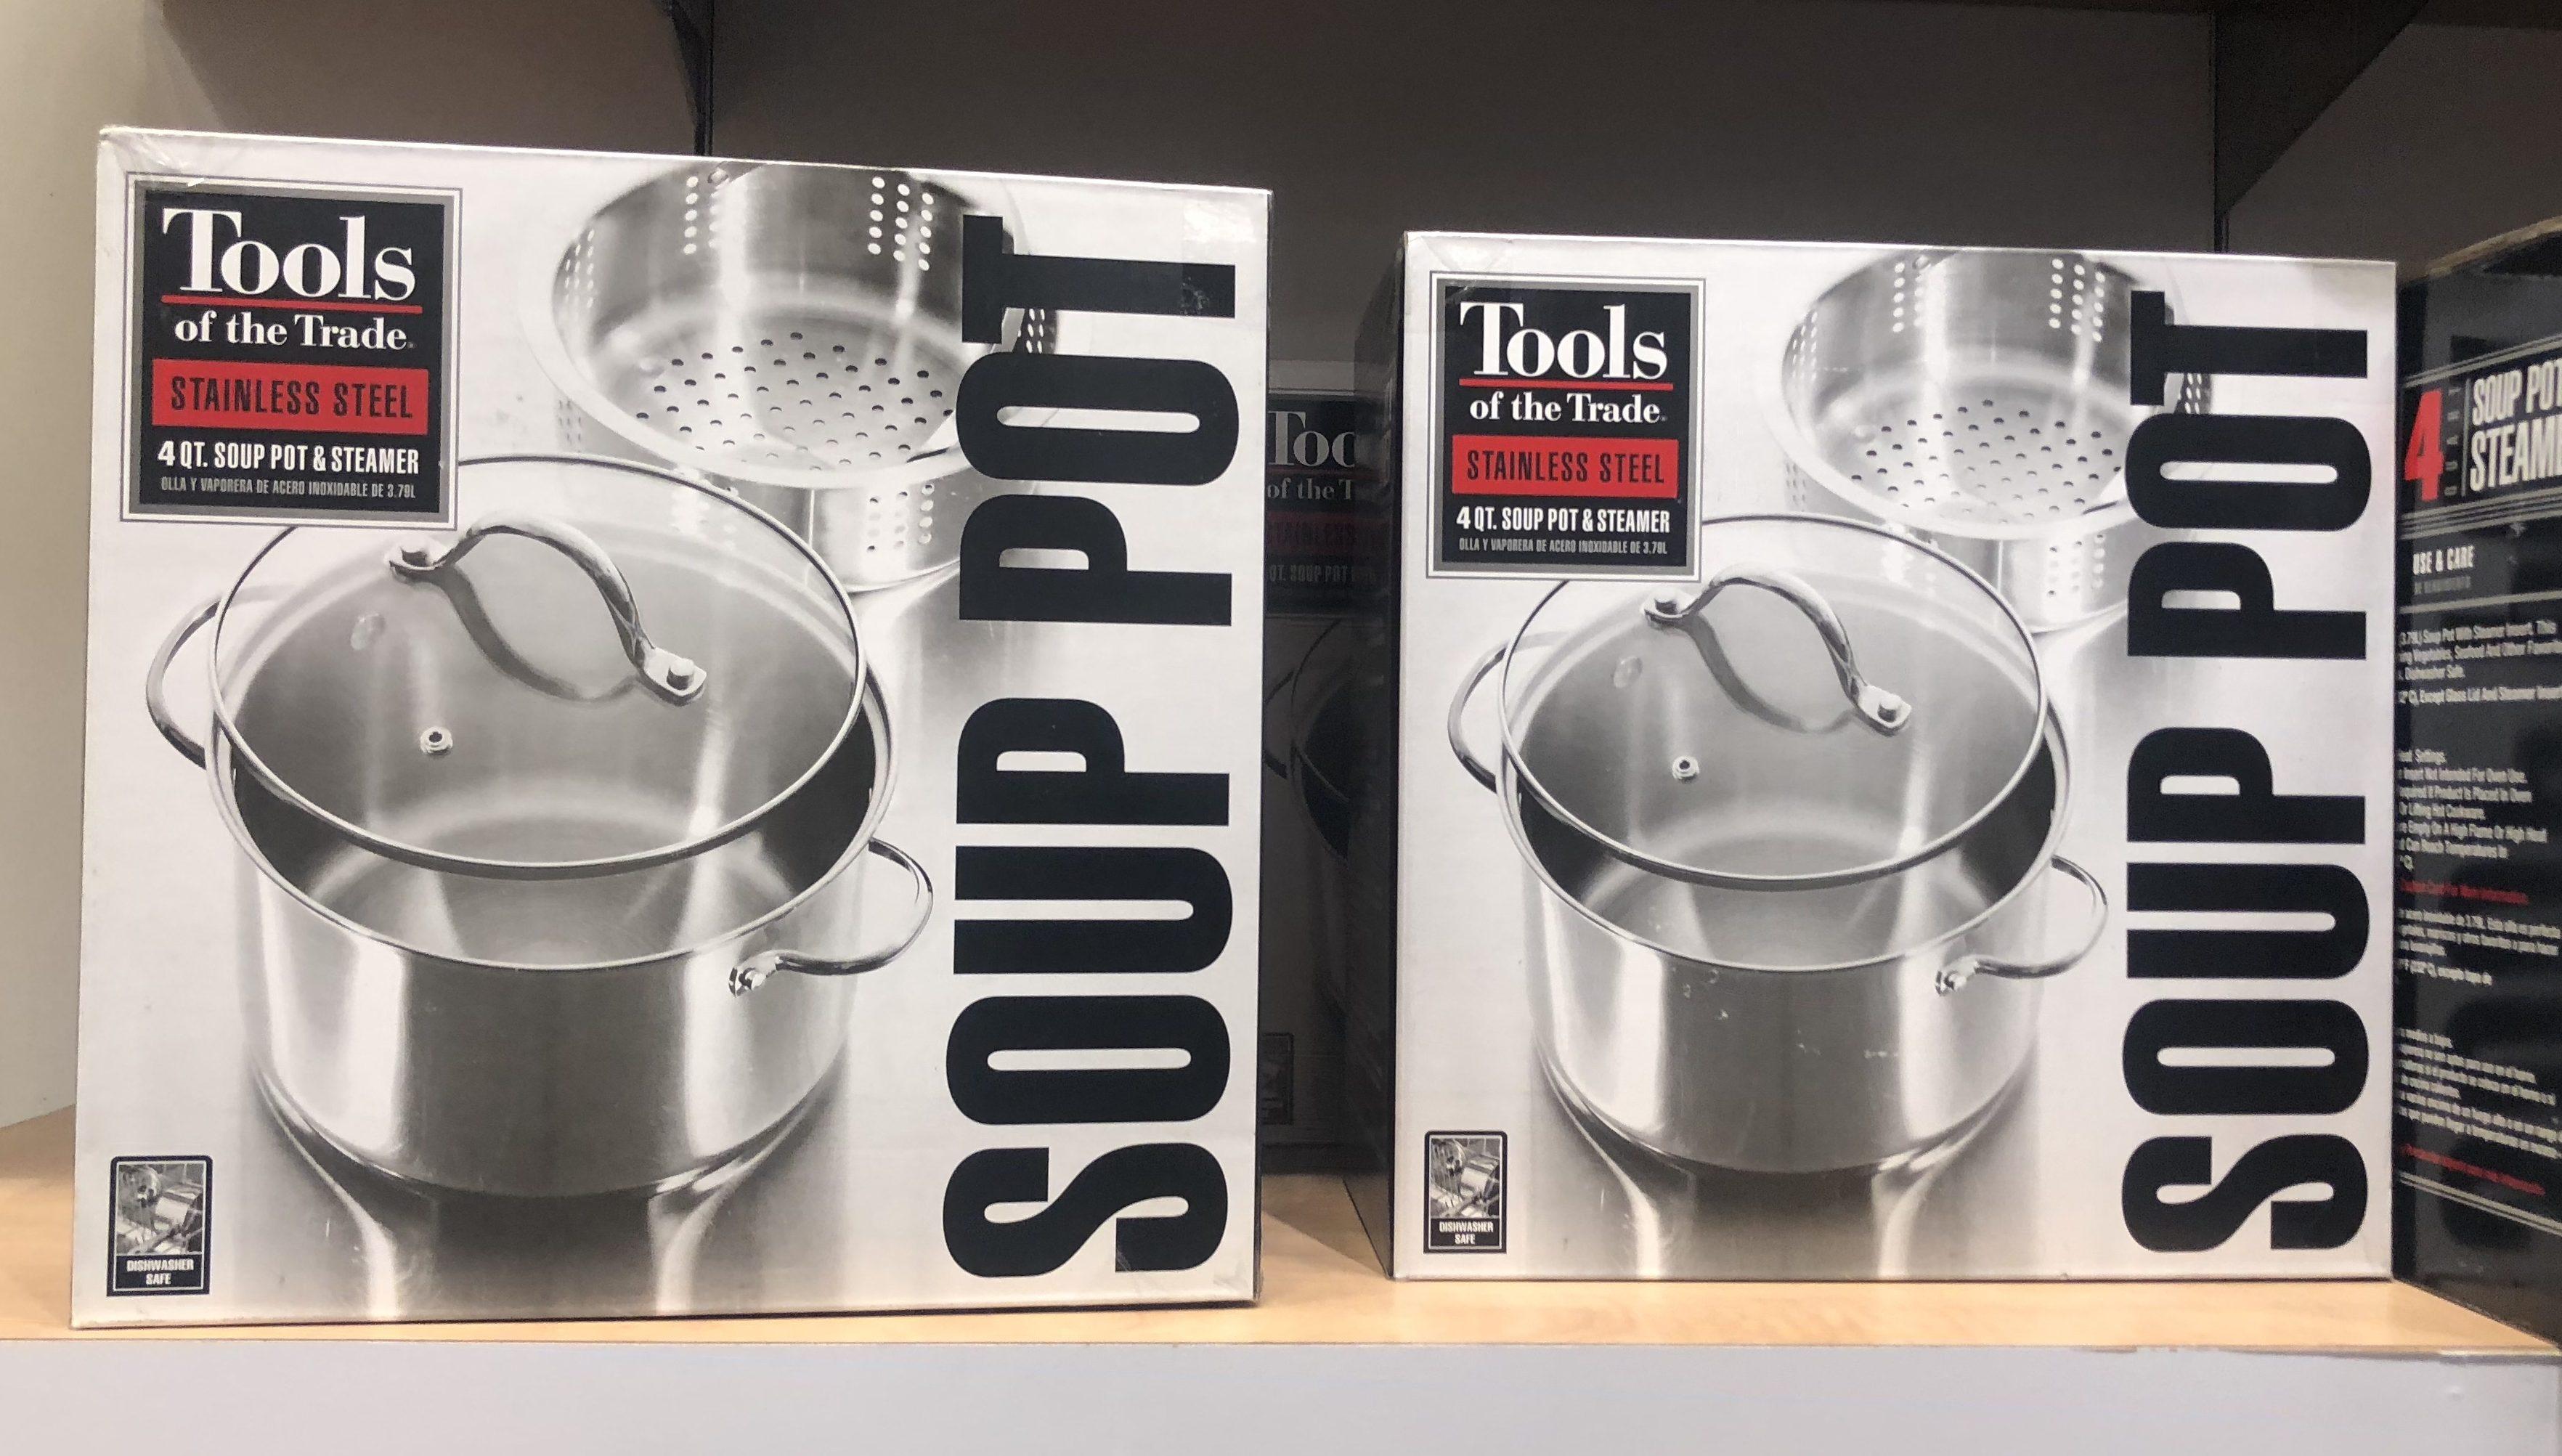 Macy's Black Friday 2018 Deals – Tools of The Trade Soup Pot at Macy's